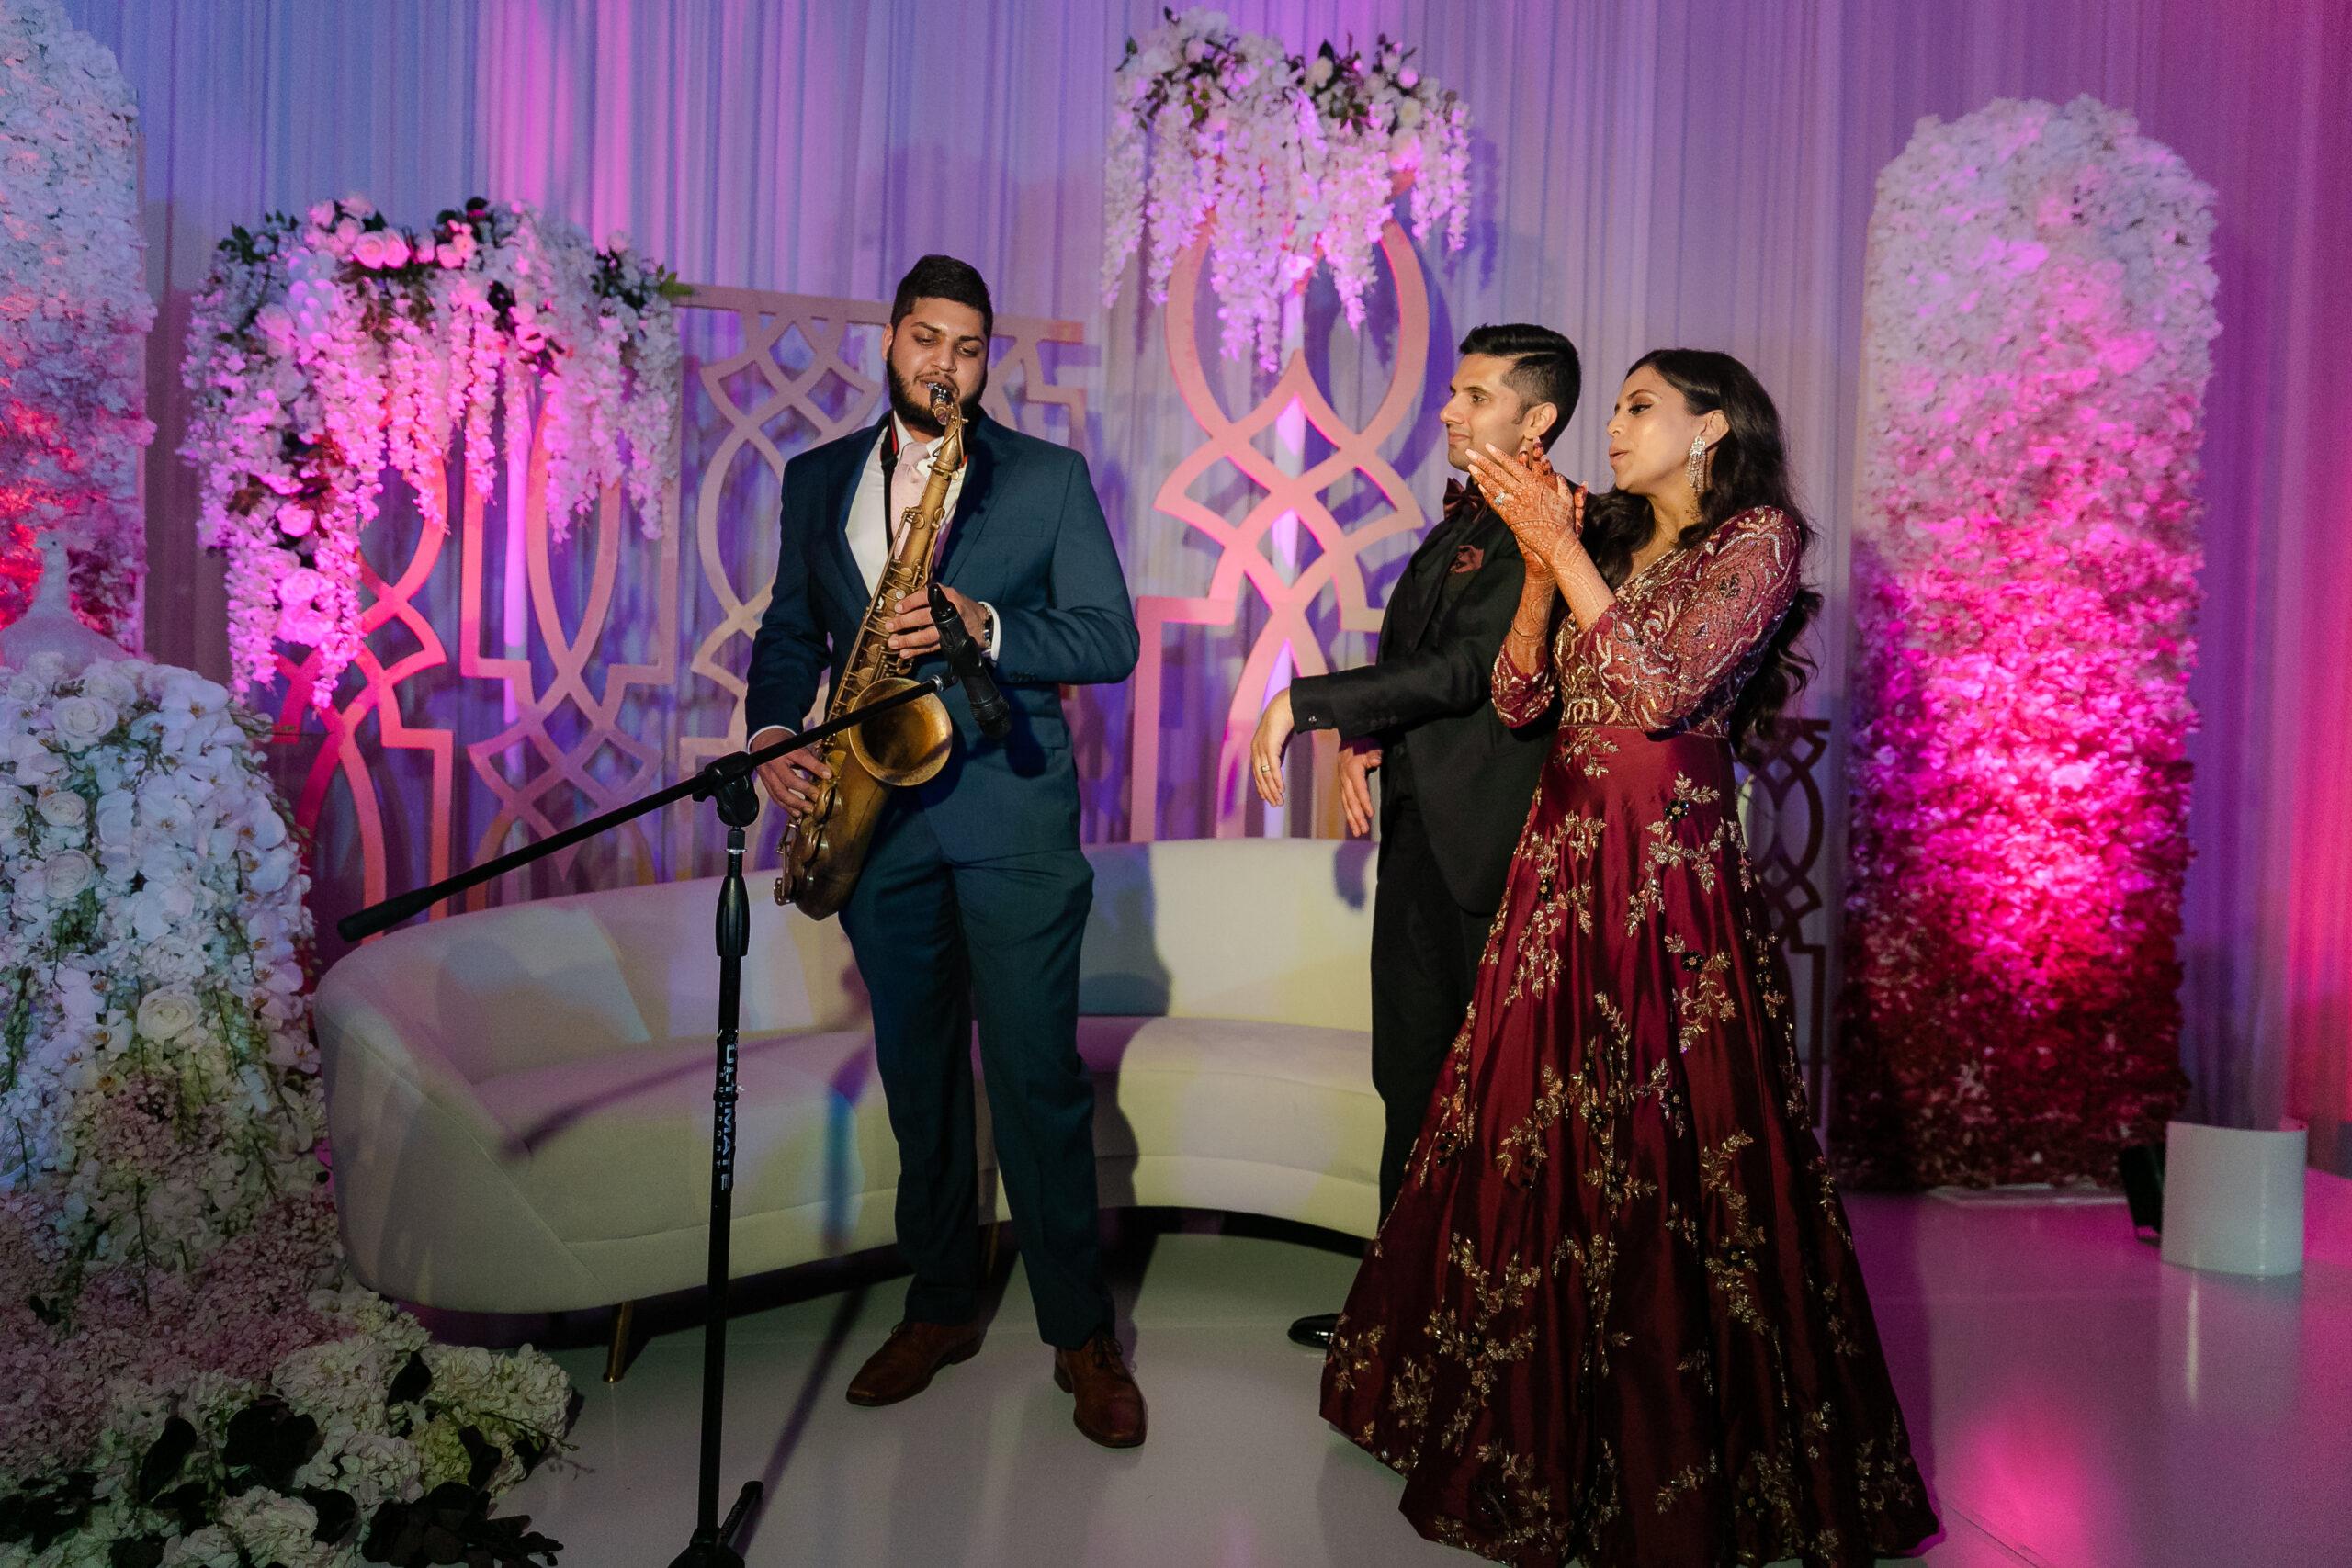 1289-SK-Hotel-Irvine-Orange-County-Wedding-Photography